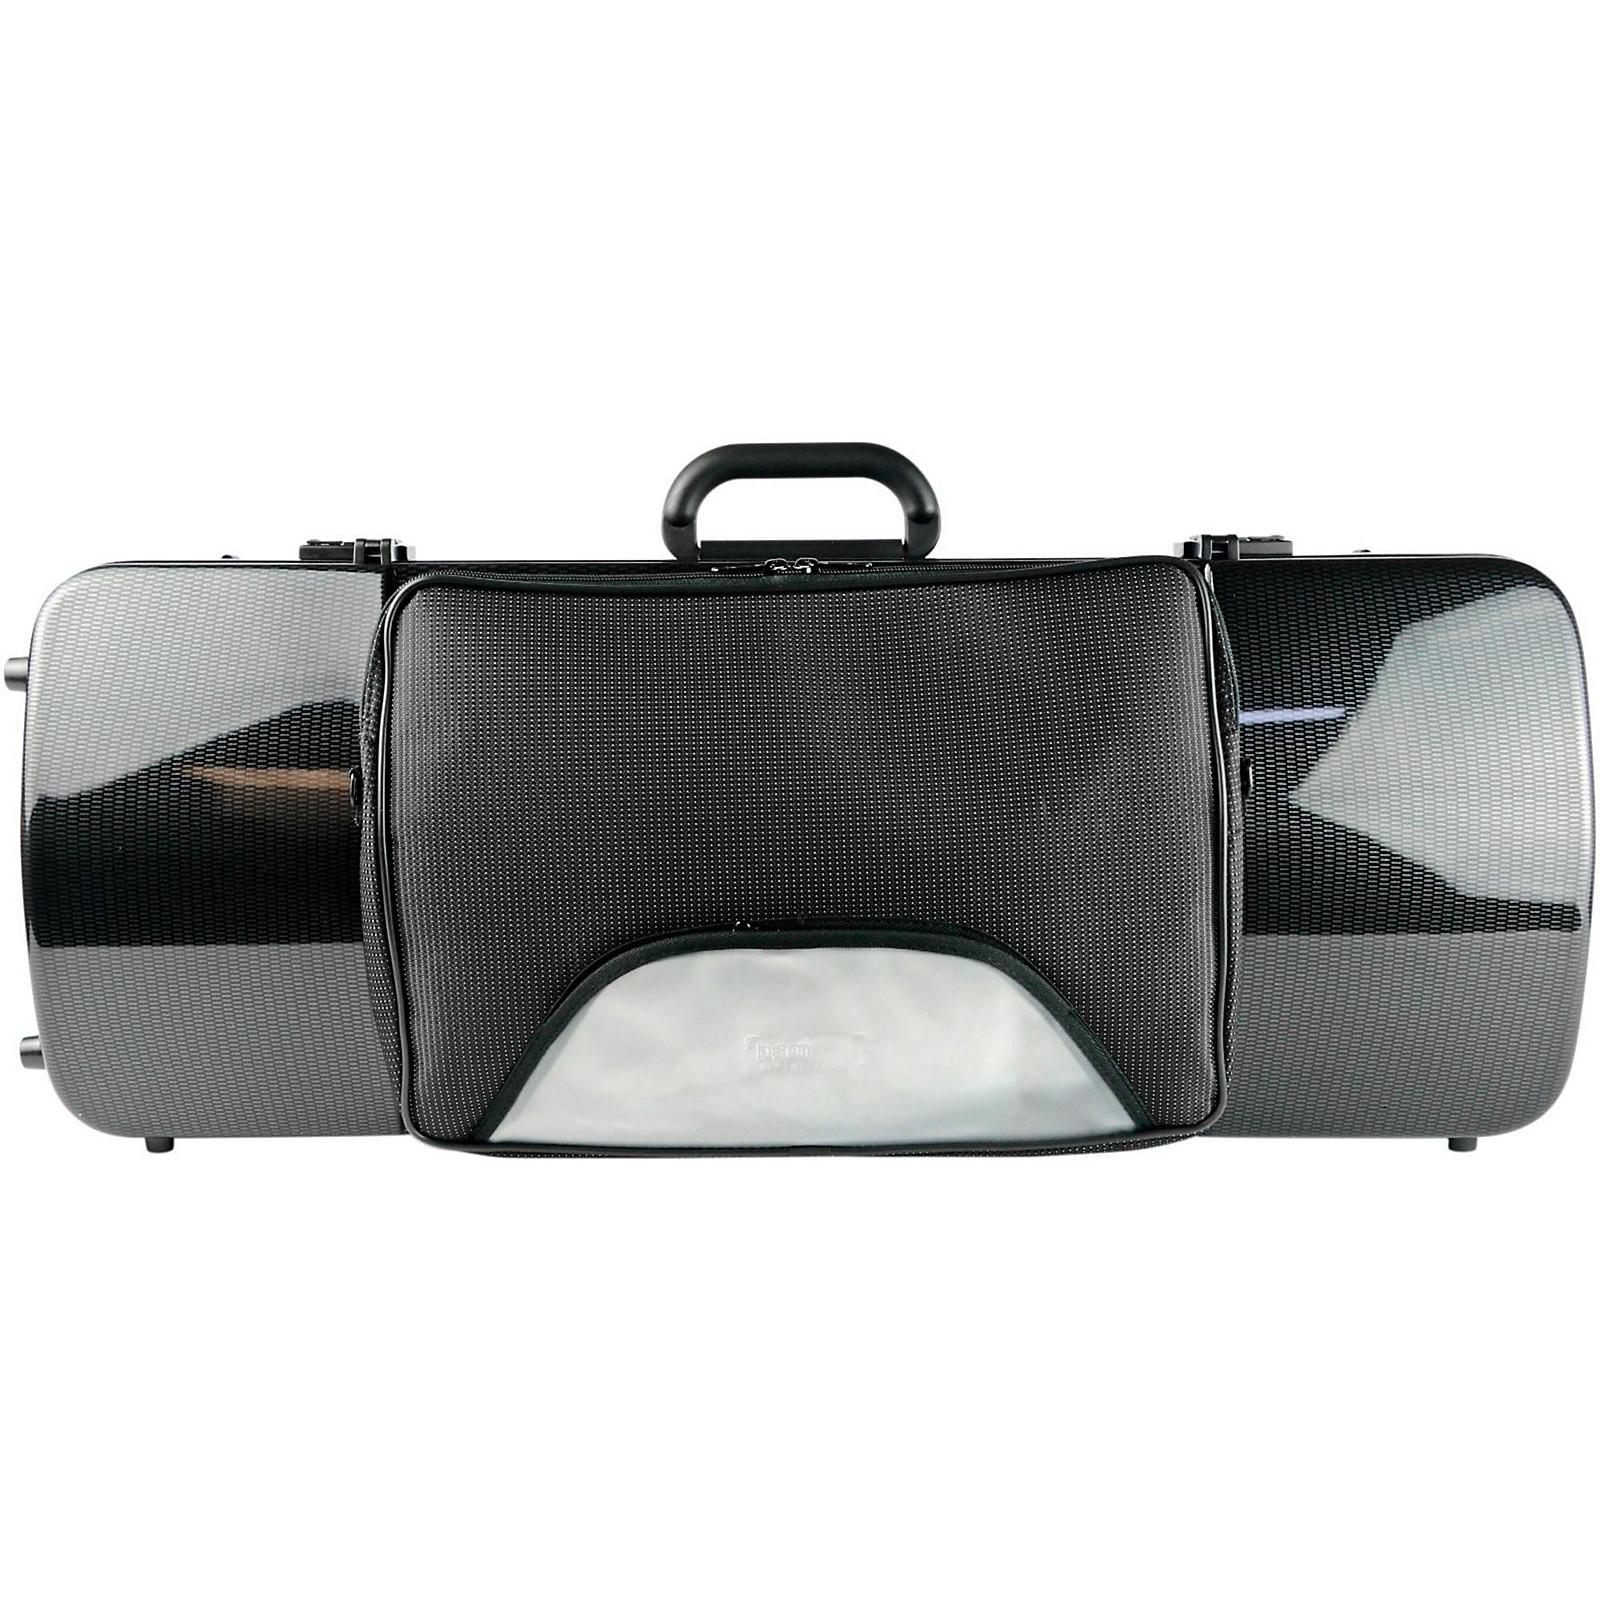 Bam 2202XL Hightech Large Adjustable Viola Case with Pocket